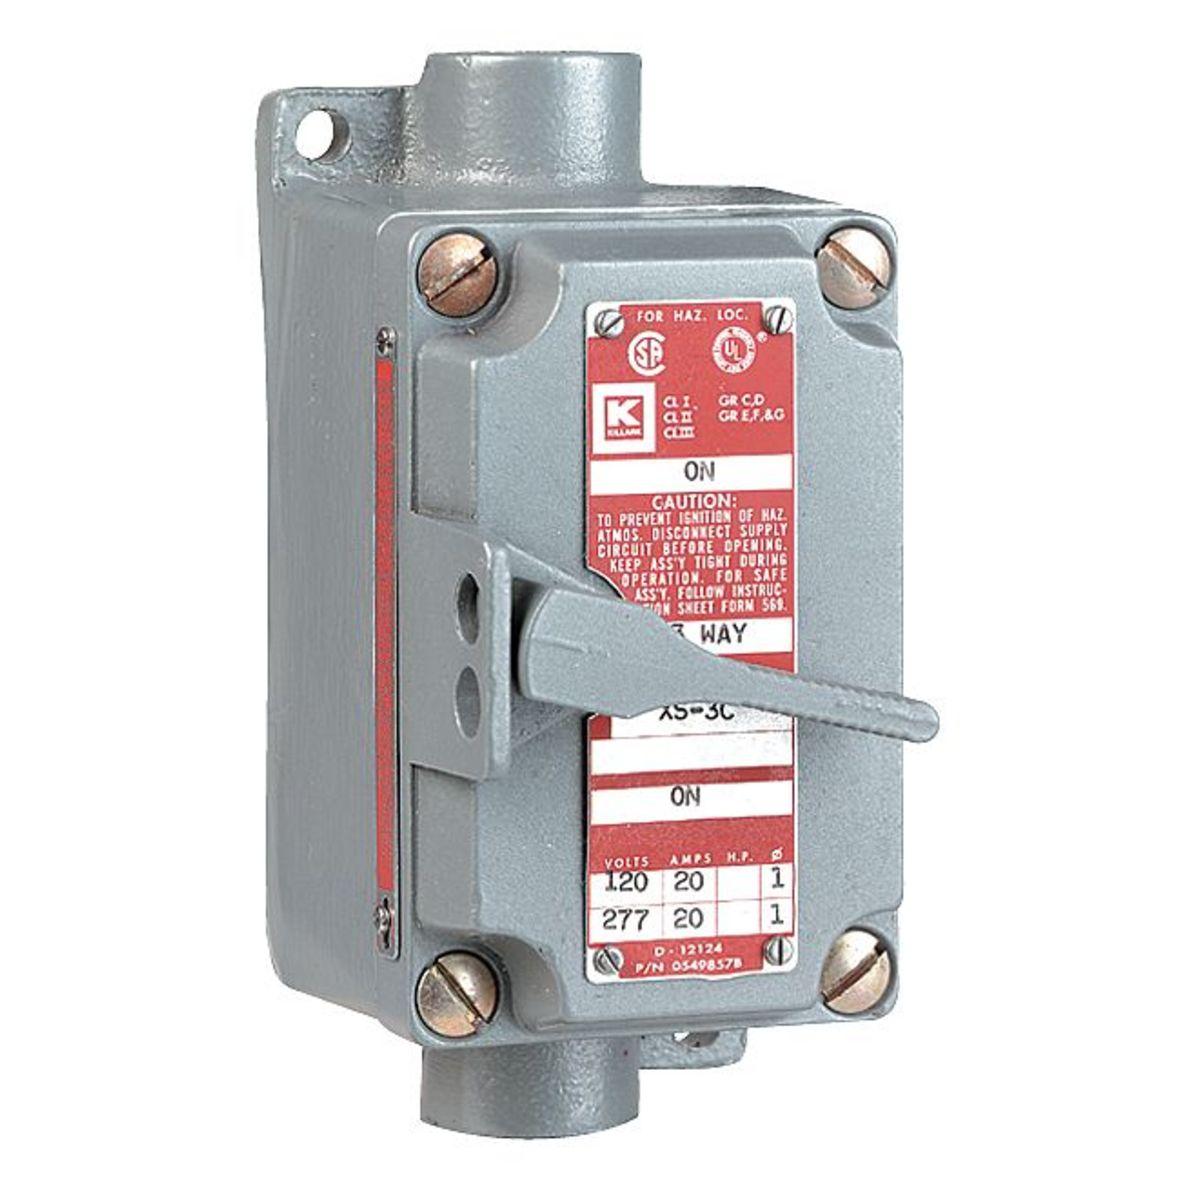 Hubbell manual motor starter toggle haz location gamut for Hazardous location motor starter